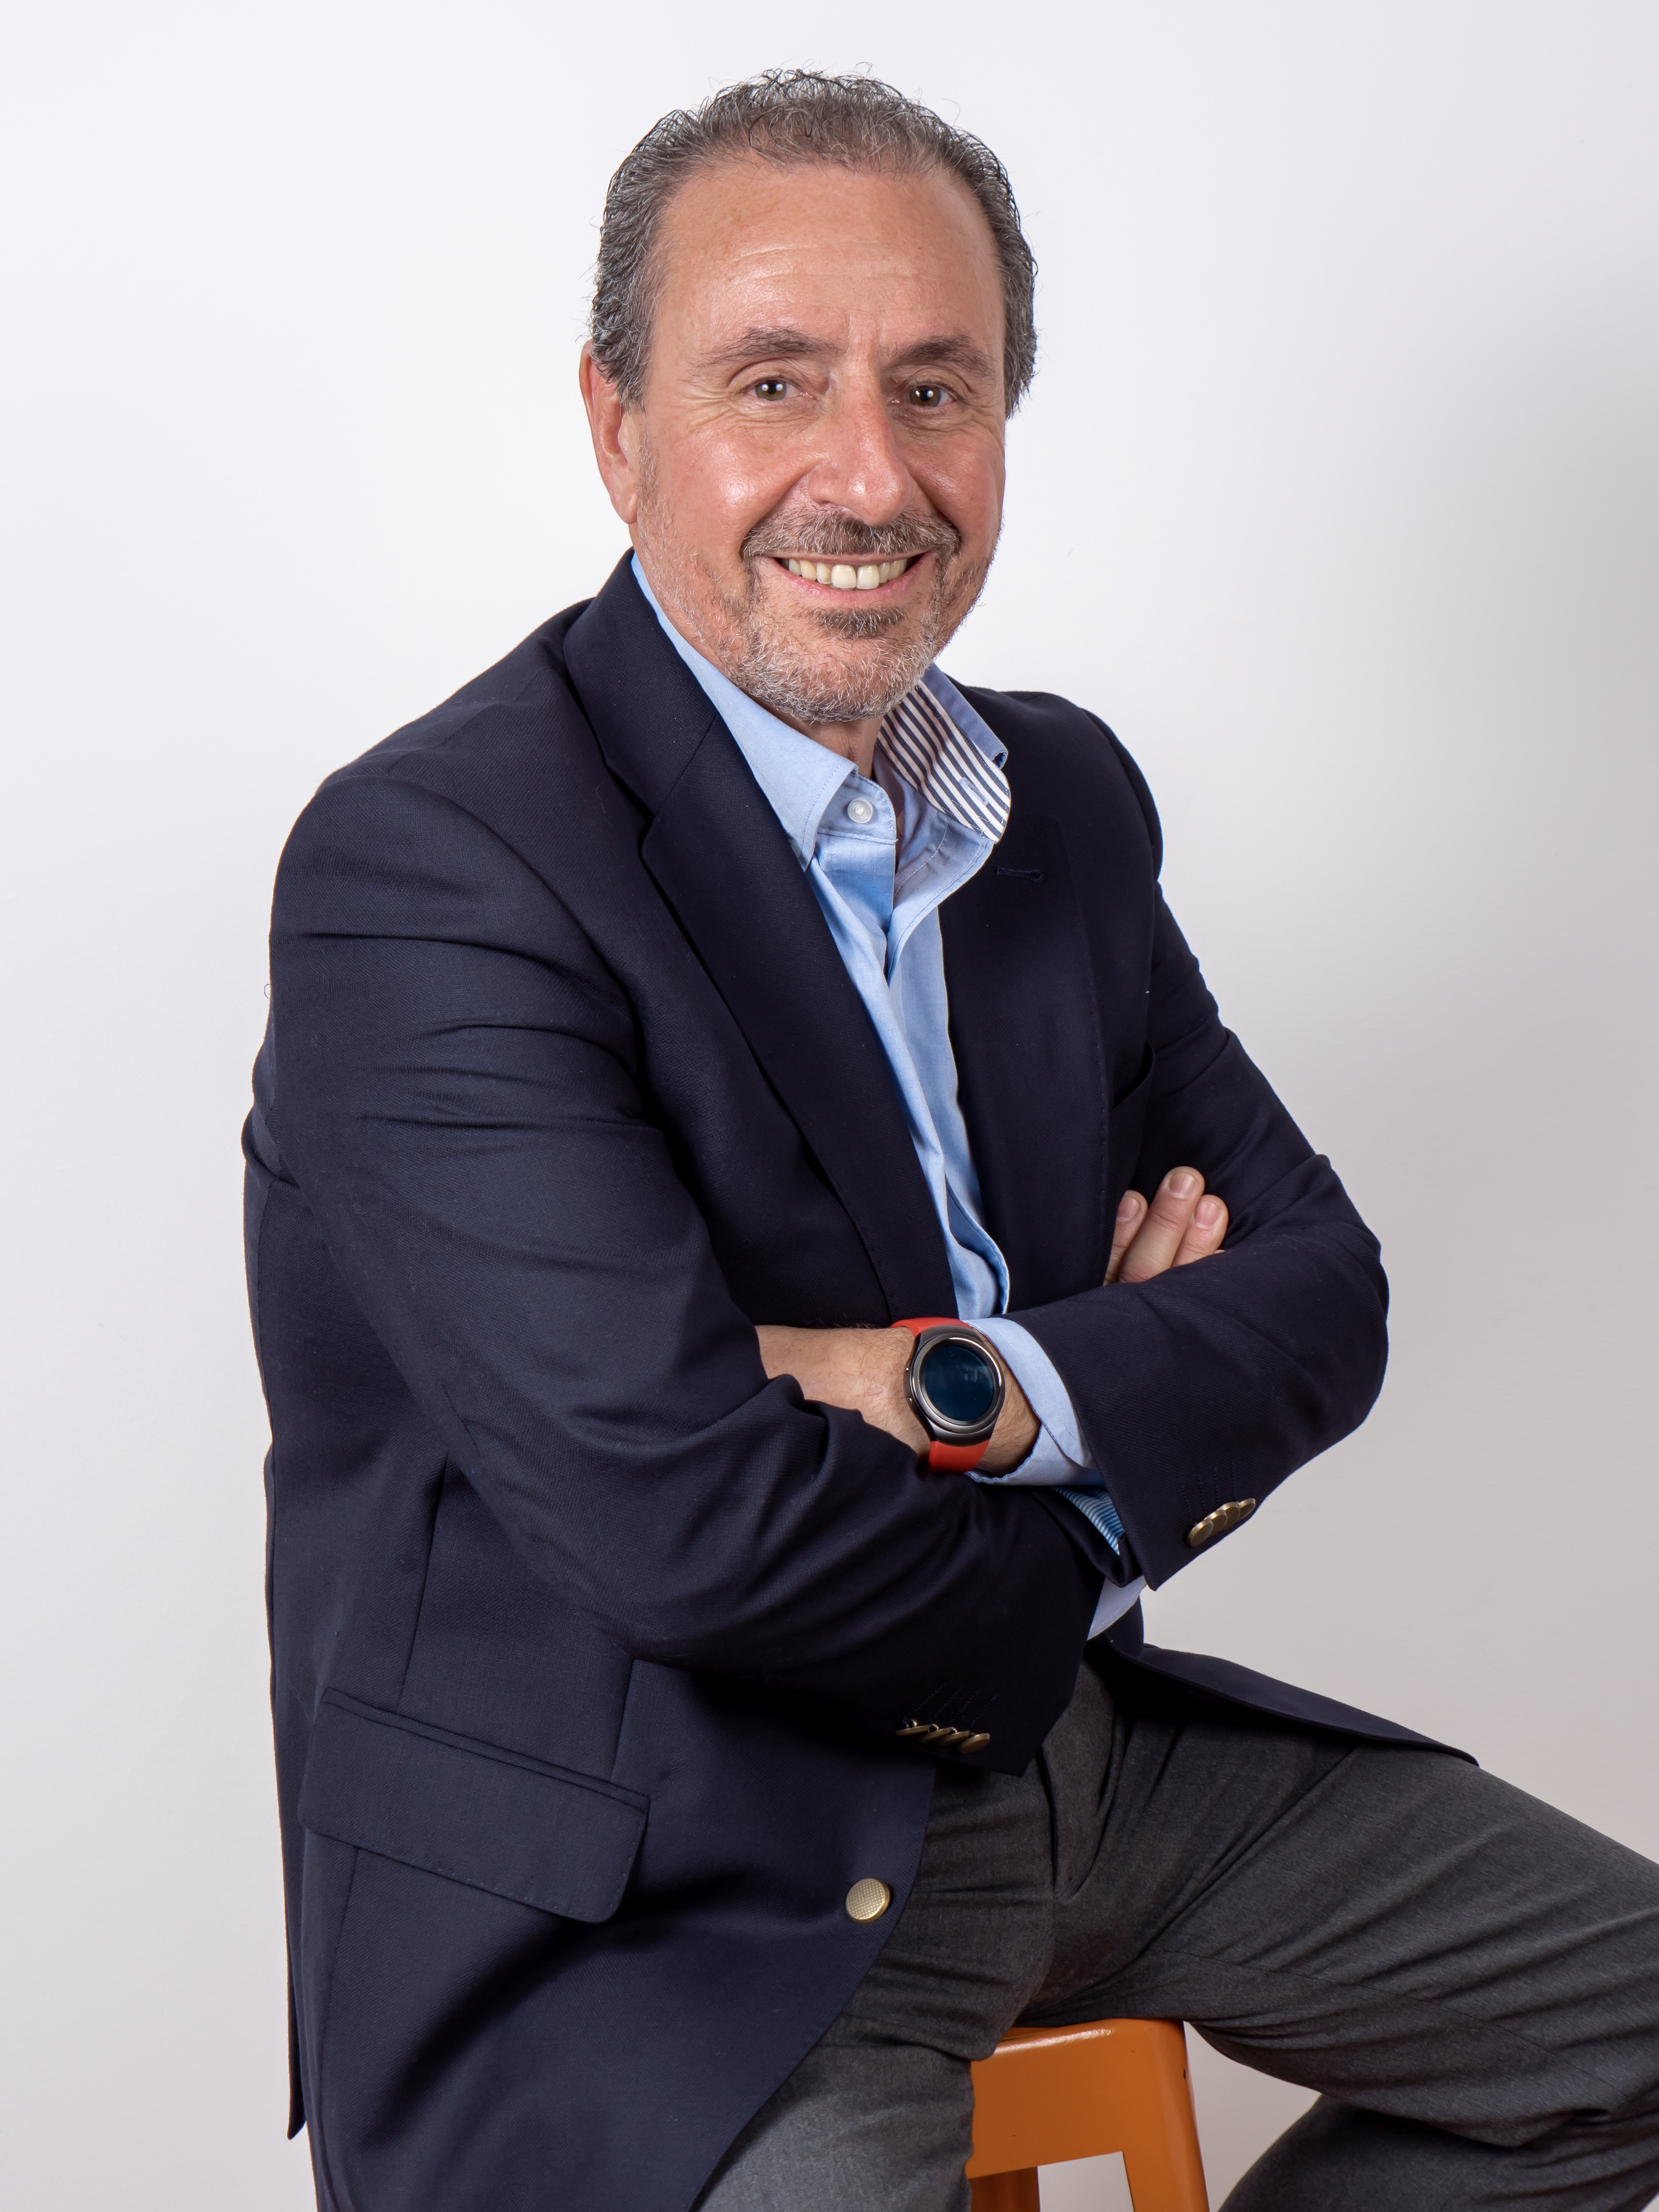 Javier Valdes Puelles